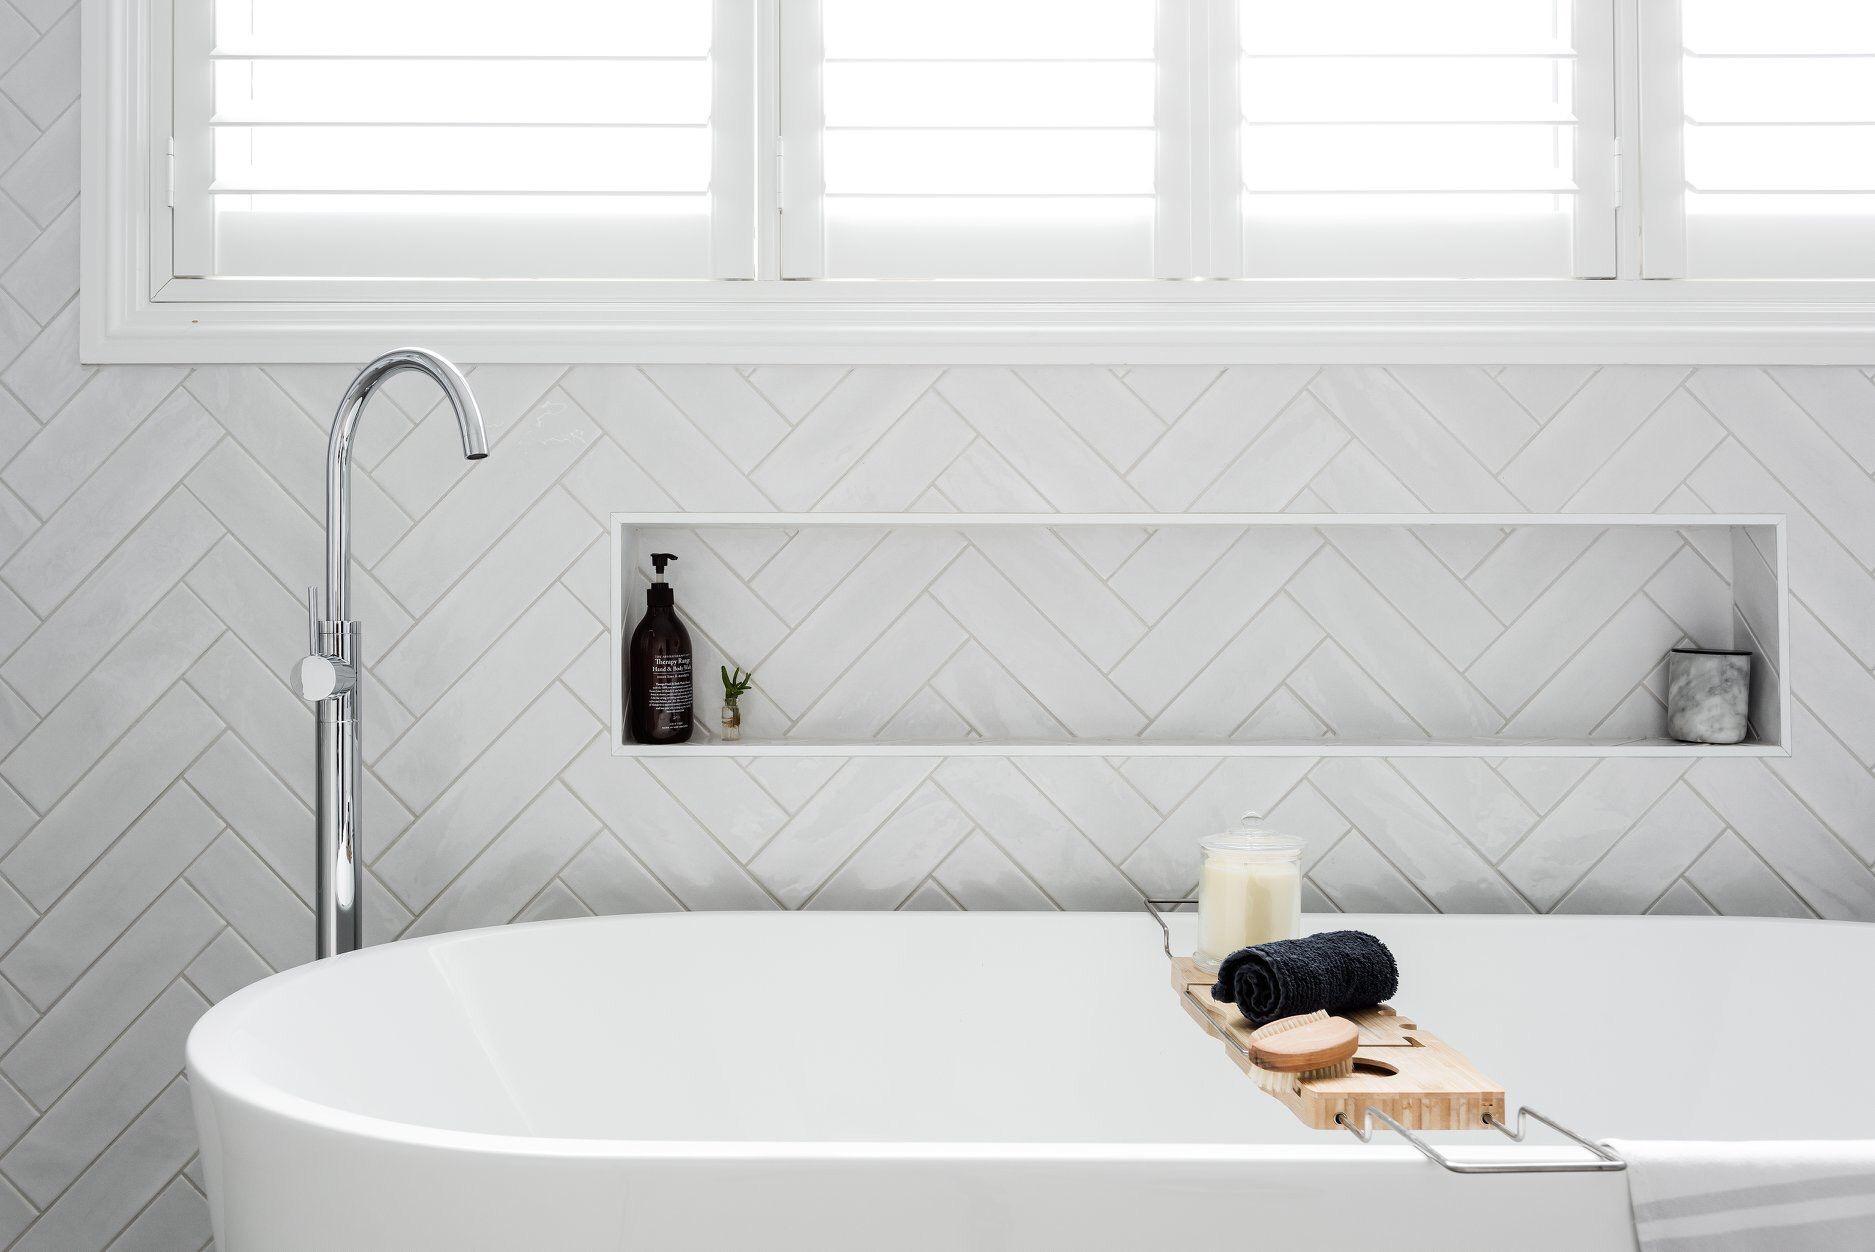 Amber Tiles Kellyville Bathroom Design Bathroom Feature Wall Trendy Bathroom Tiles Herringbone Tile Bathroom